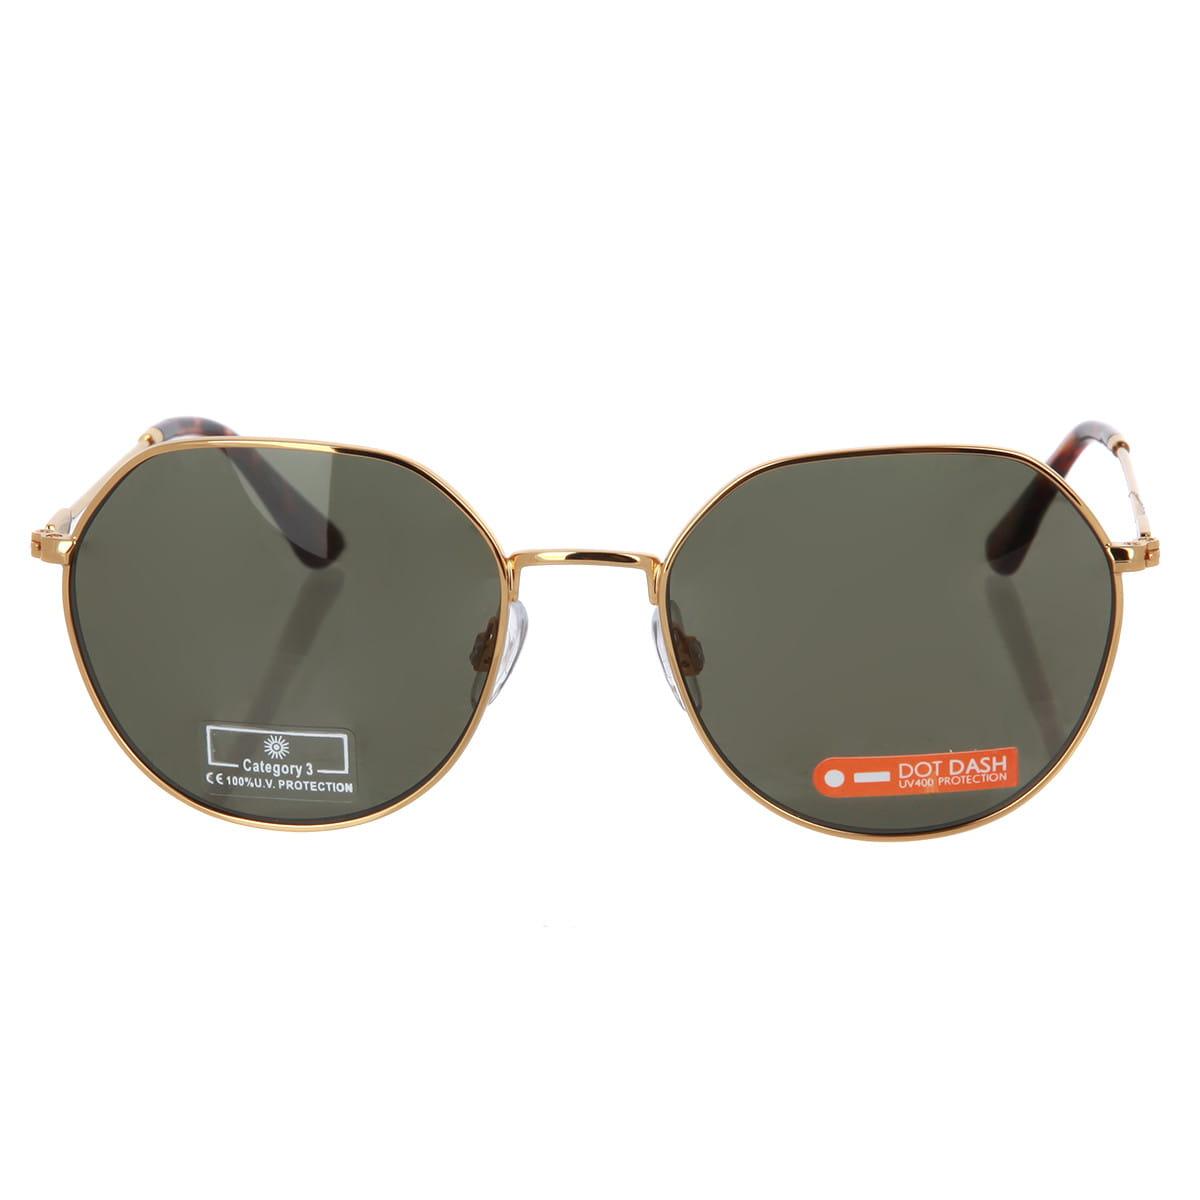 Унисекс/Аксессуары/Солнцезащитные очки/Солнцезащитные очки Солнцезащитные очки Jitters